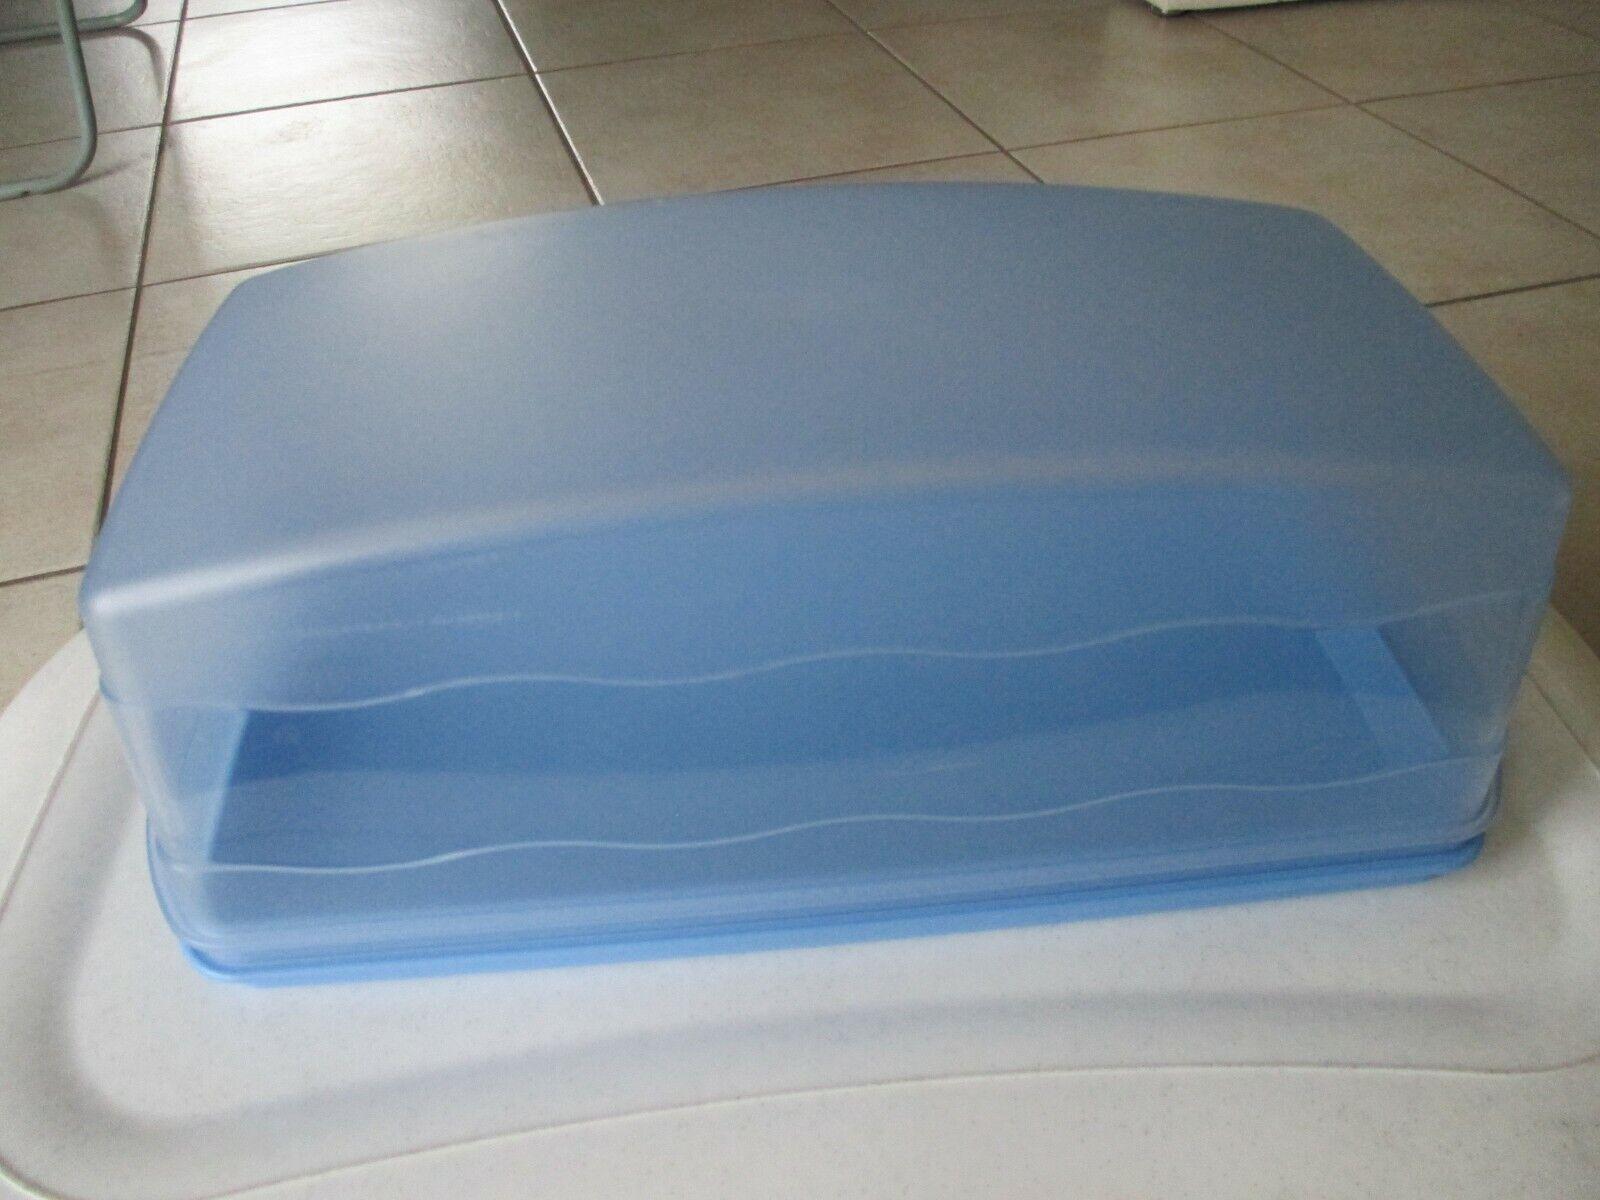 Tupperware junge Welle Kastenkuchenbehälter hellblau